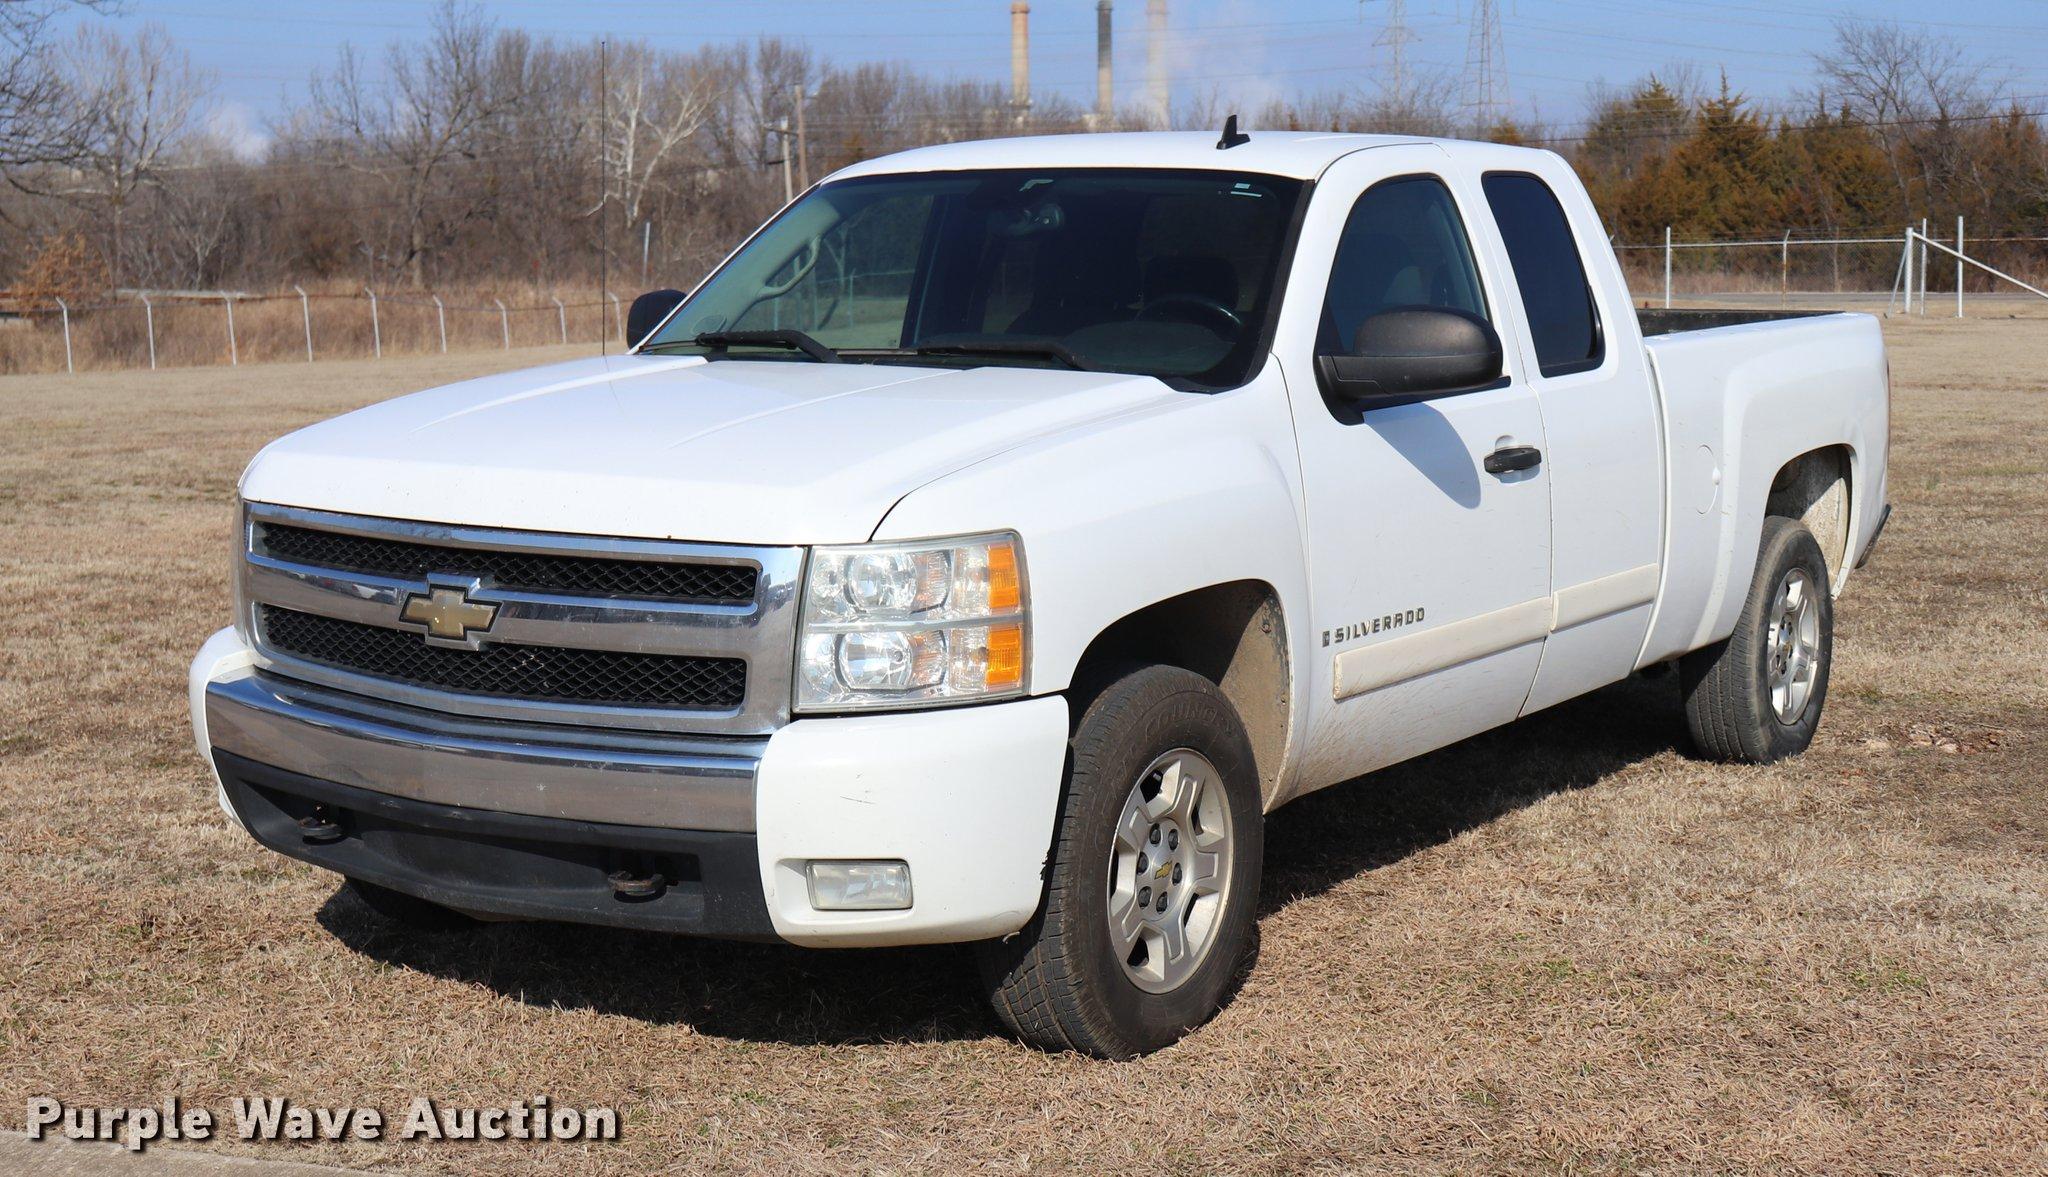 2007 Chevrolet Silverado 1500 Ext Cab pickup truck